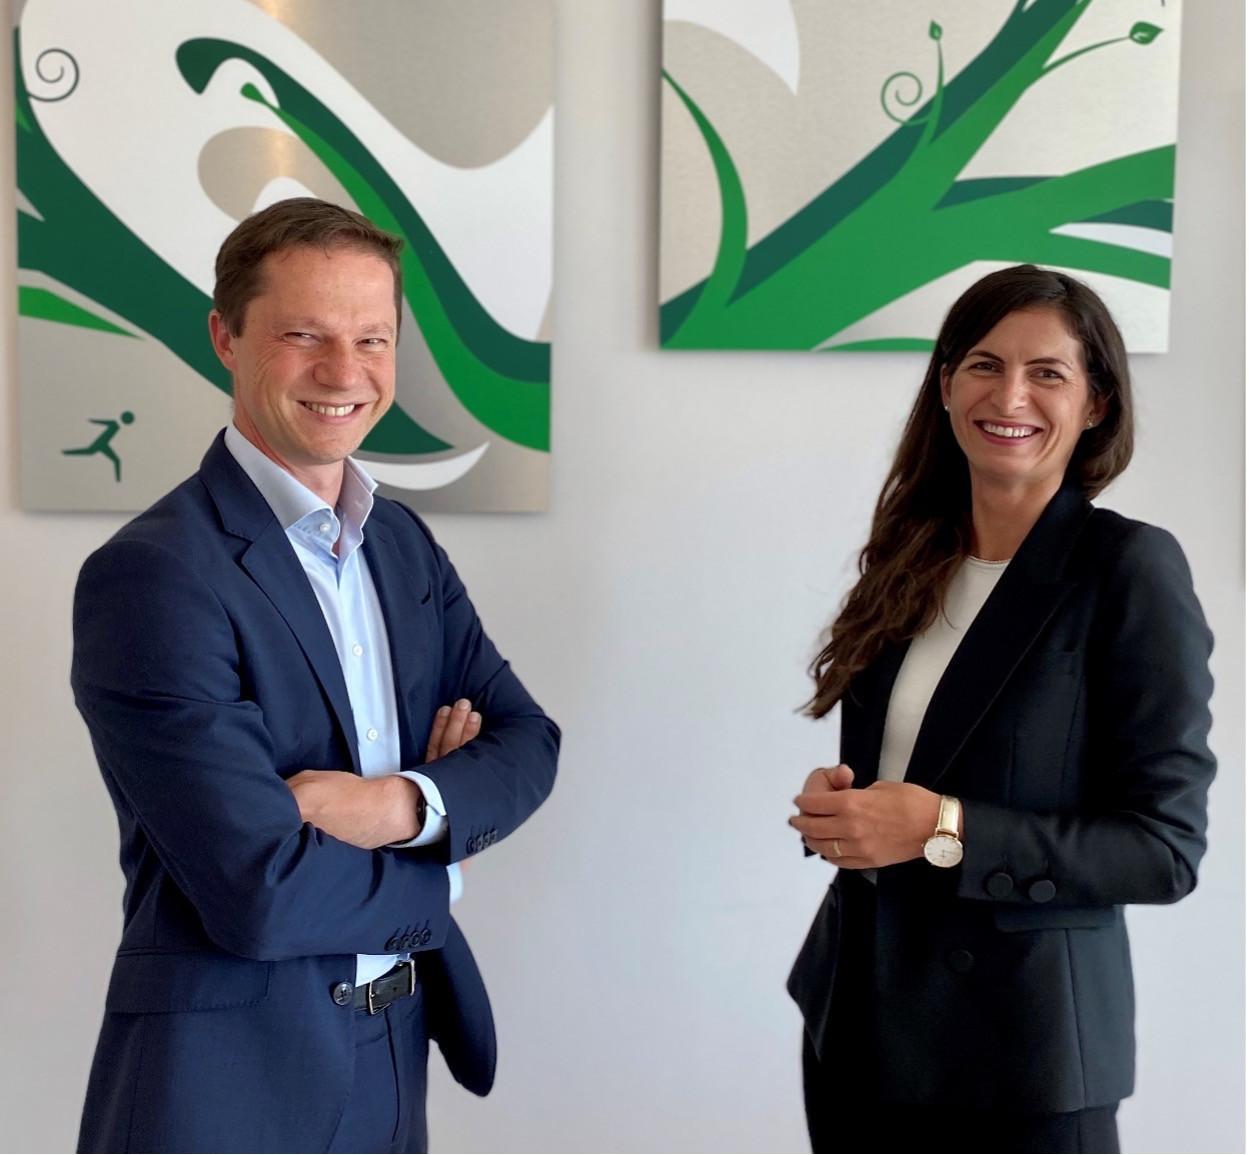 Gwenaël Gavray, Associate Partner, and Magdalena Murawska, Senior Manager at Avantage Reply Luxembourg  (Crédit: Avantage Reply Luxembourg)